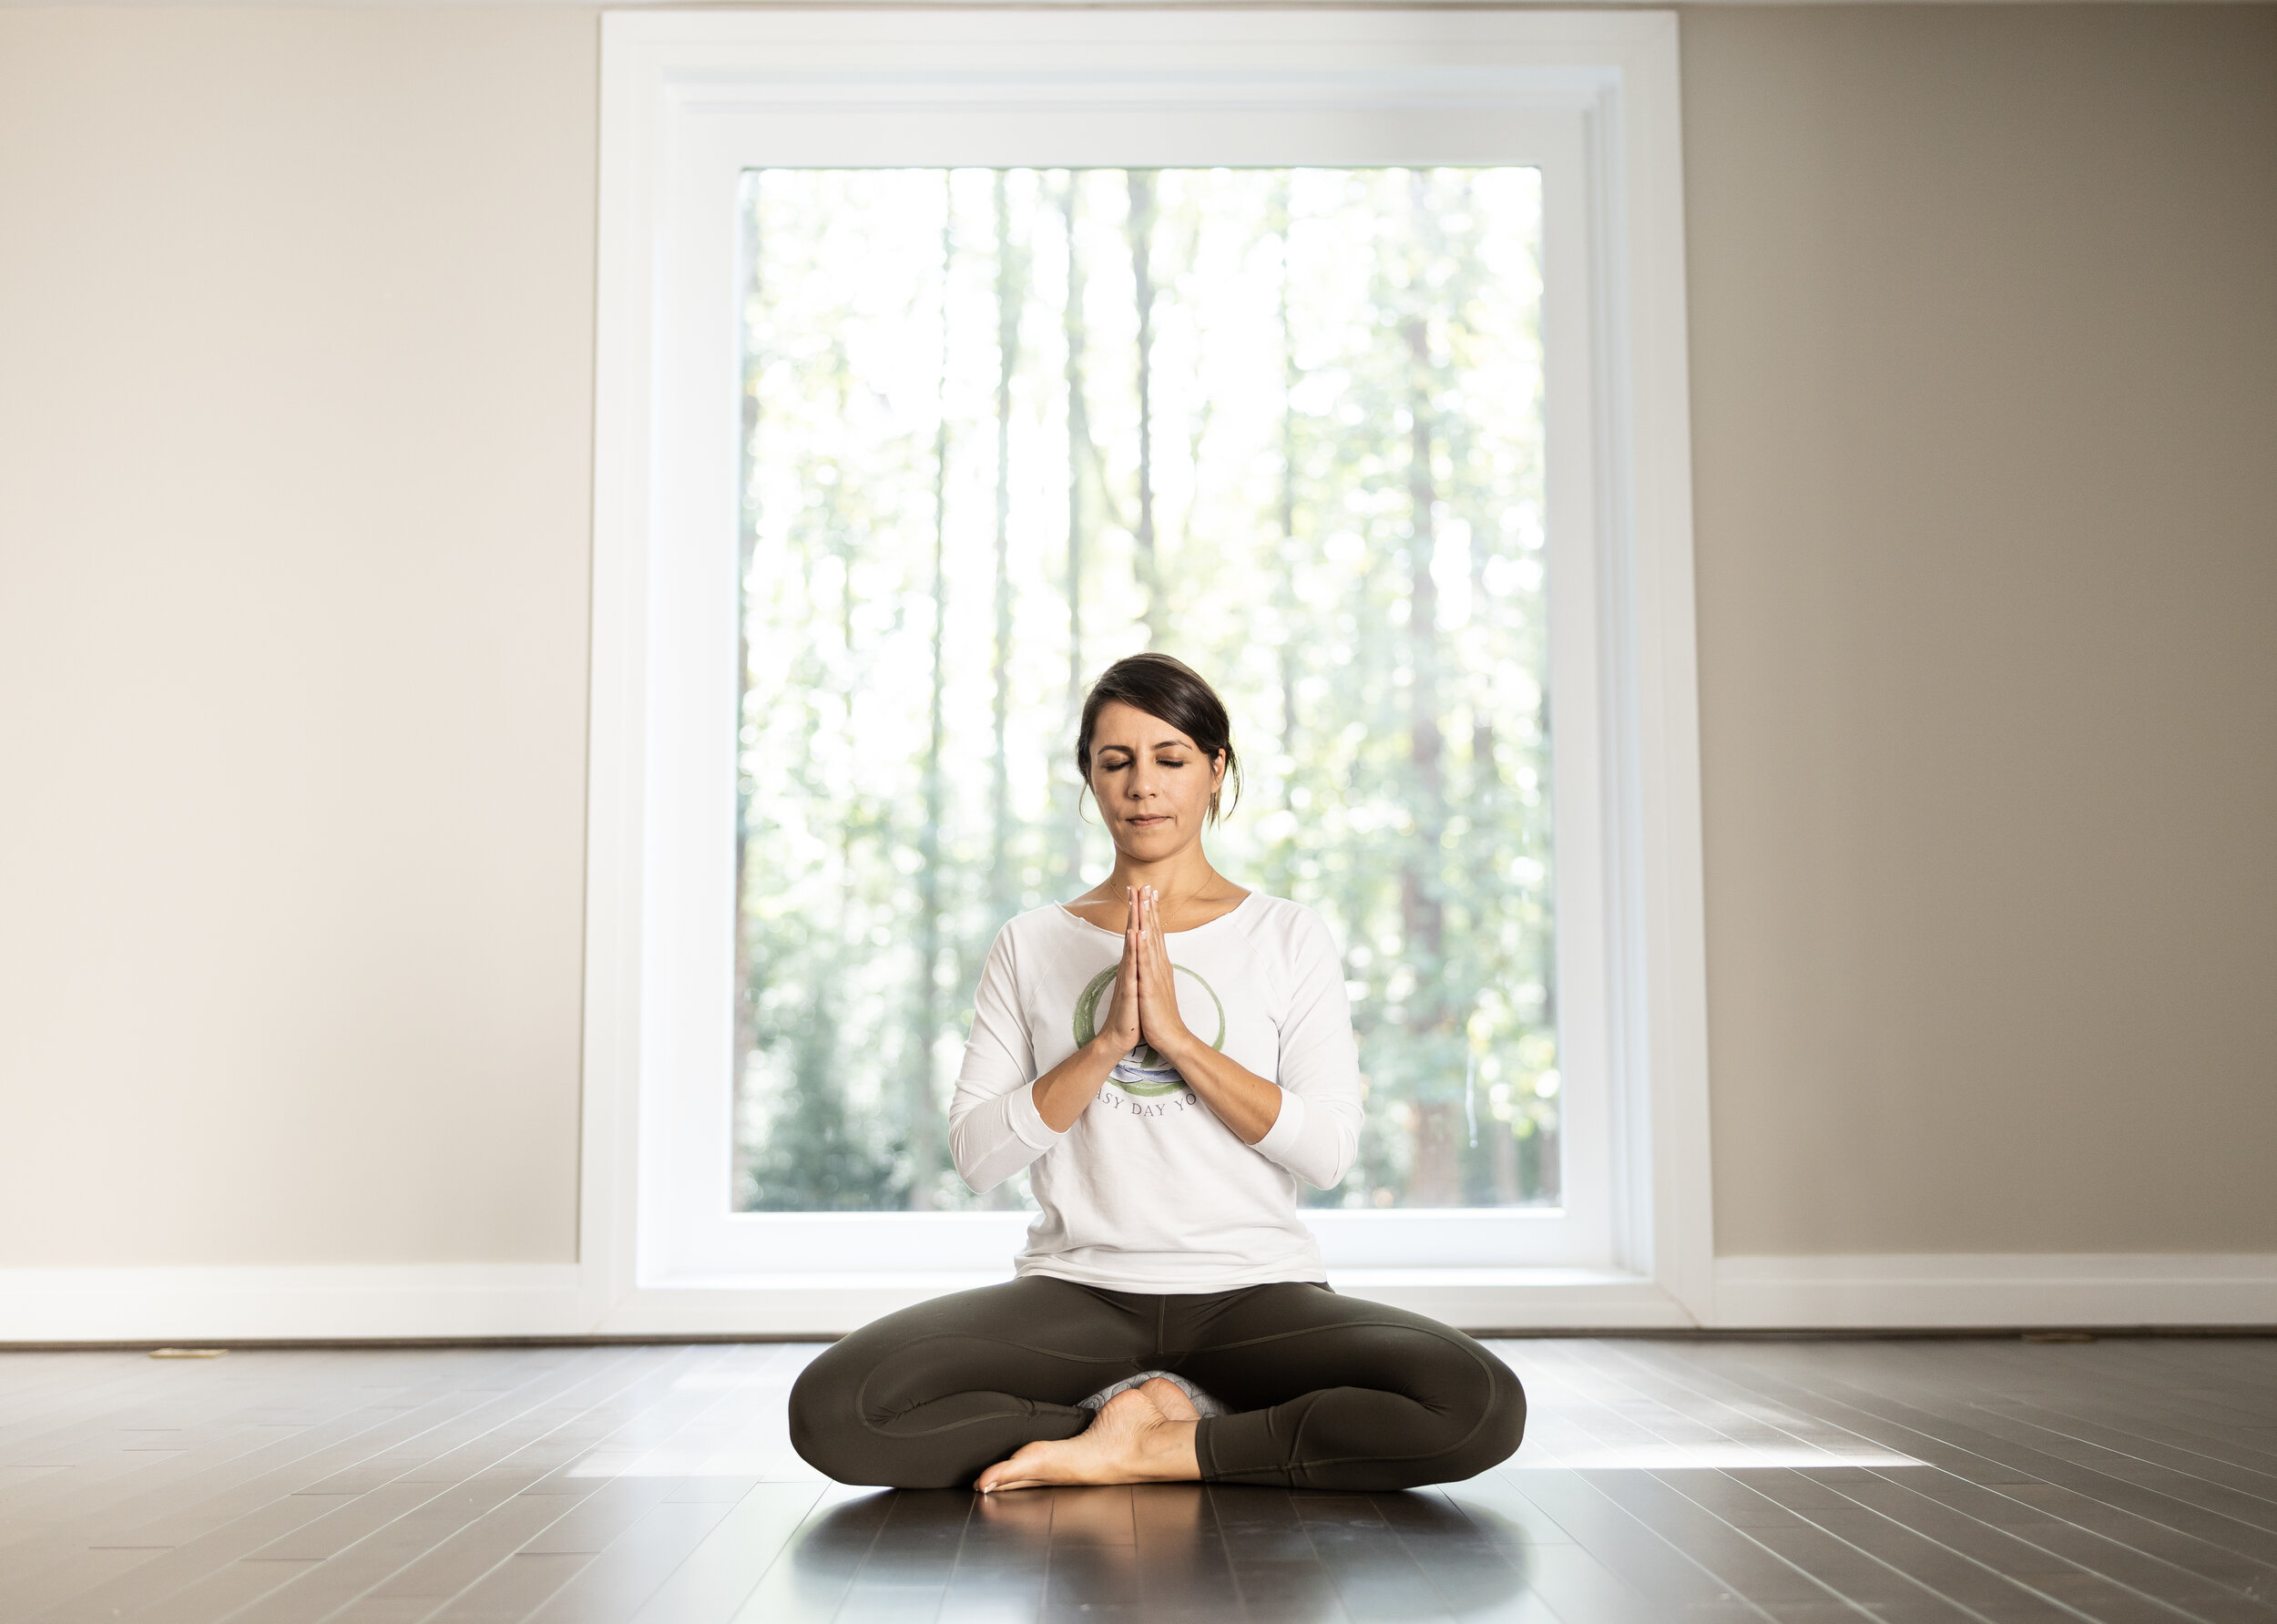 Azi Tavassoli, Founder of Easy Day Yoga in Ashburn, Va